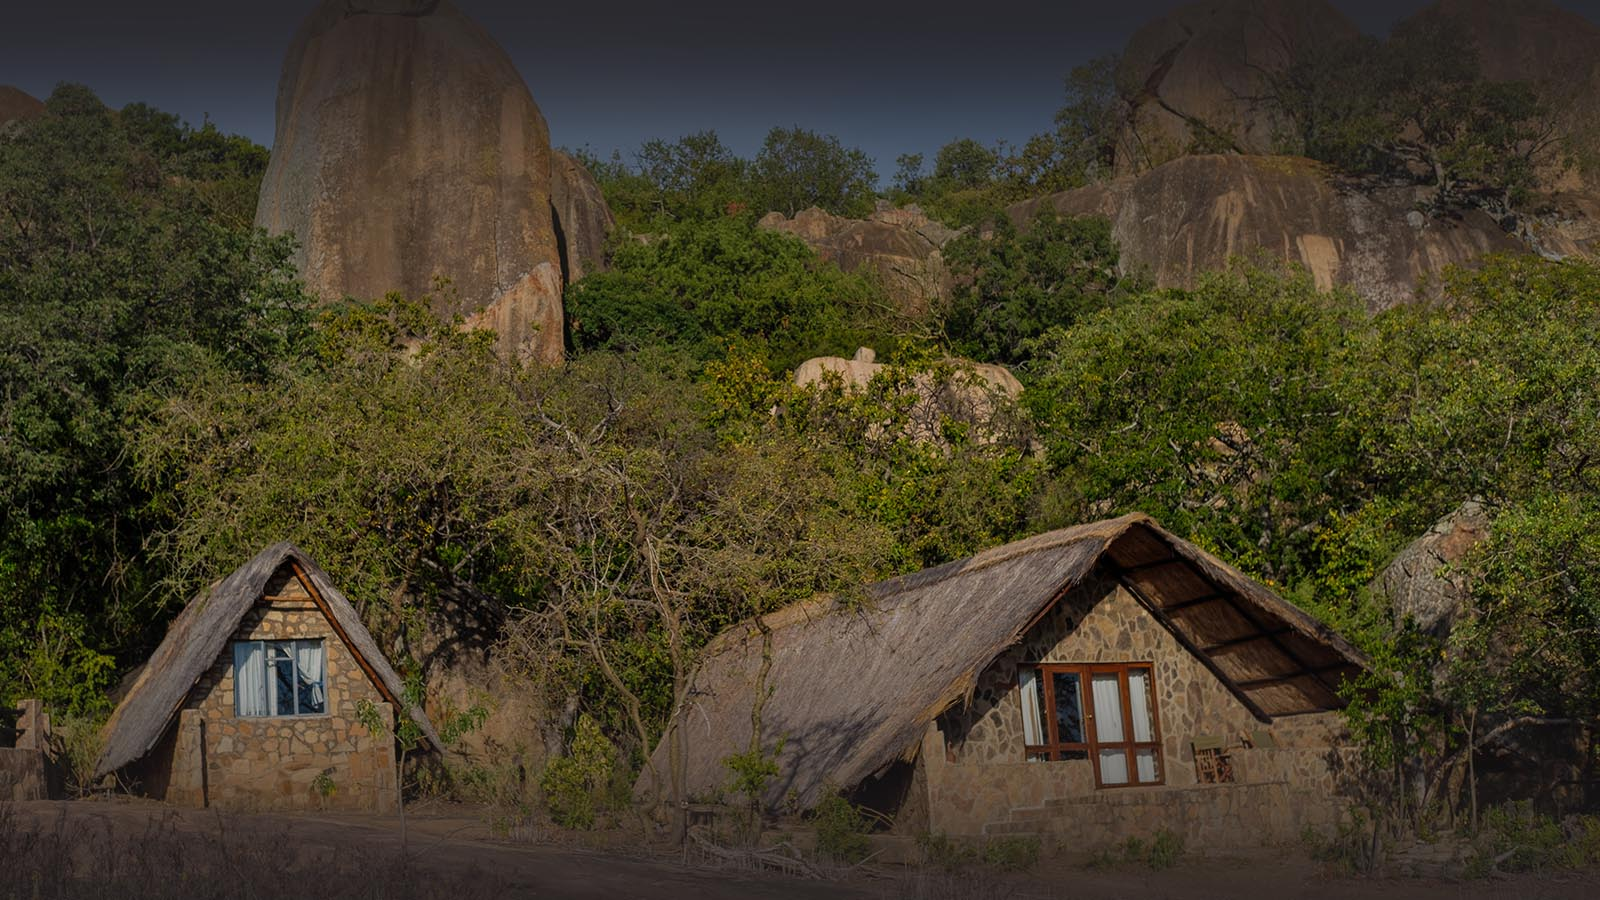 big cave camp matobo-hills-national-park-zimbabwe-ndwangu-front-view